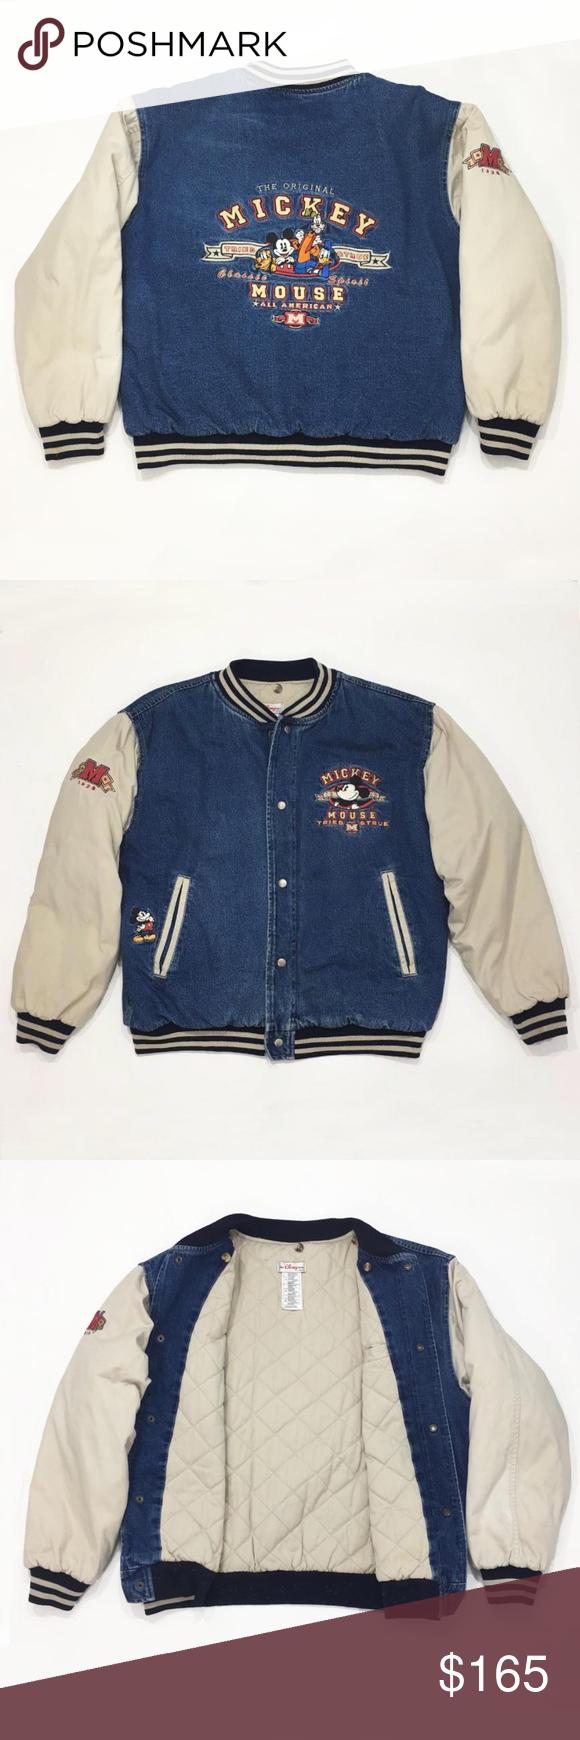 Disney Mickey Mouse Embroidered Varsity Jacket Jackets American Denim Clothes Design [ 1740 x 580 Pixel ]